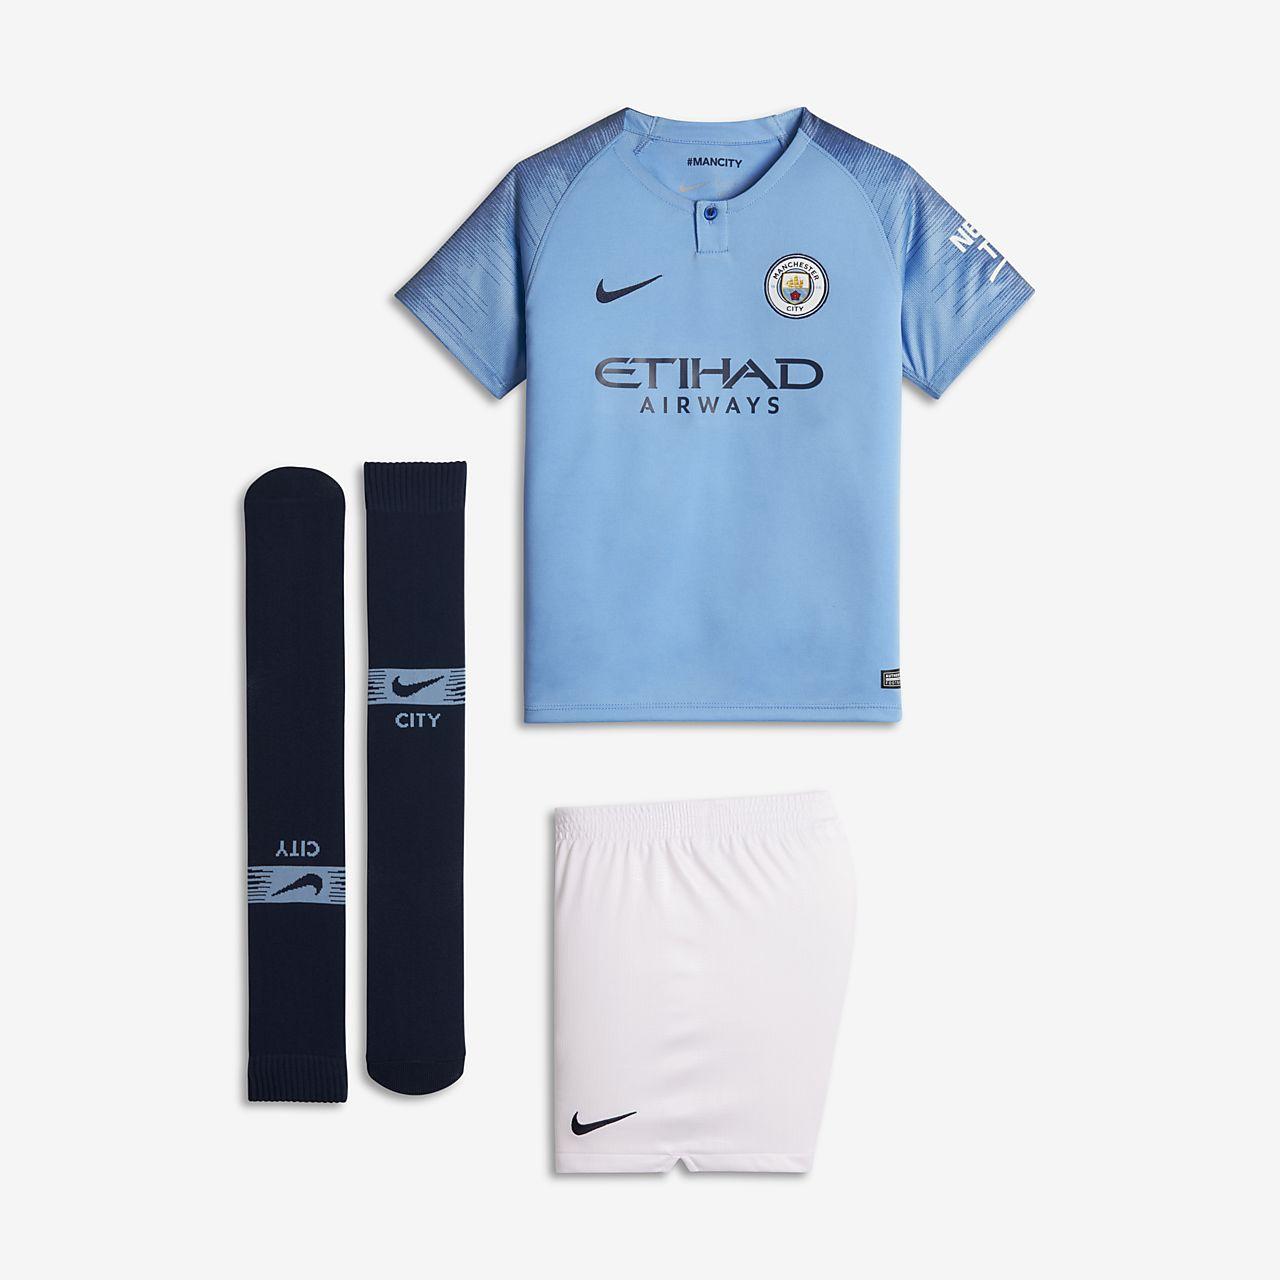 Kit de fútbol para niños talla pequeña de local Stadium del Manchester City FC 2018/19